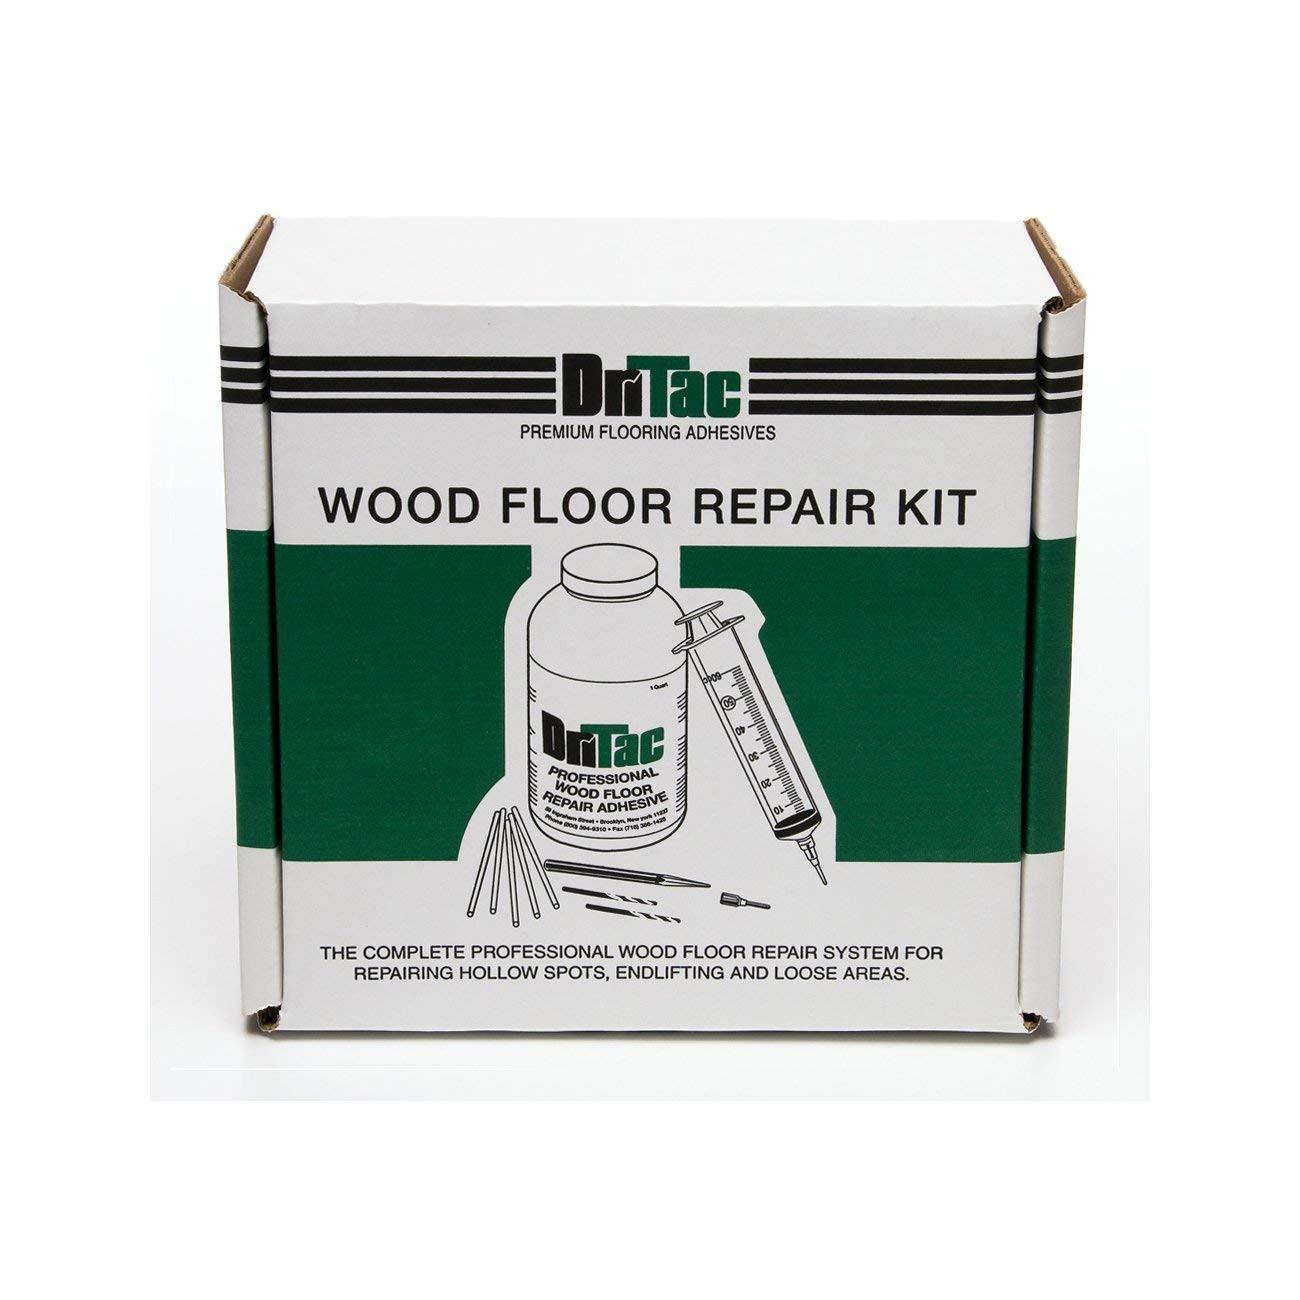 Glue Down Hardwood Floor Installation Price Of Amazon Com Dritac Wood Floor Repair Kit Engineered Flooring Only for Amazon Com Dritac Wood Floor Repair Kit Engineered Flooring Only 32oz Home Kitchen